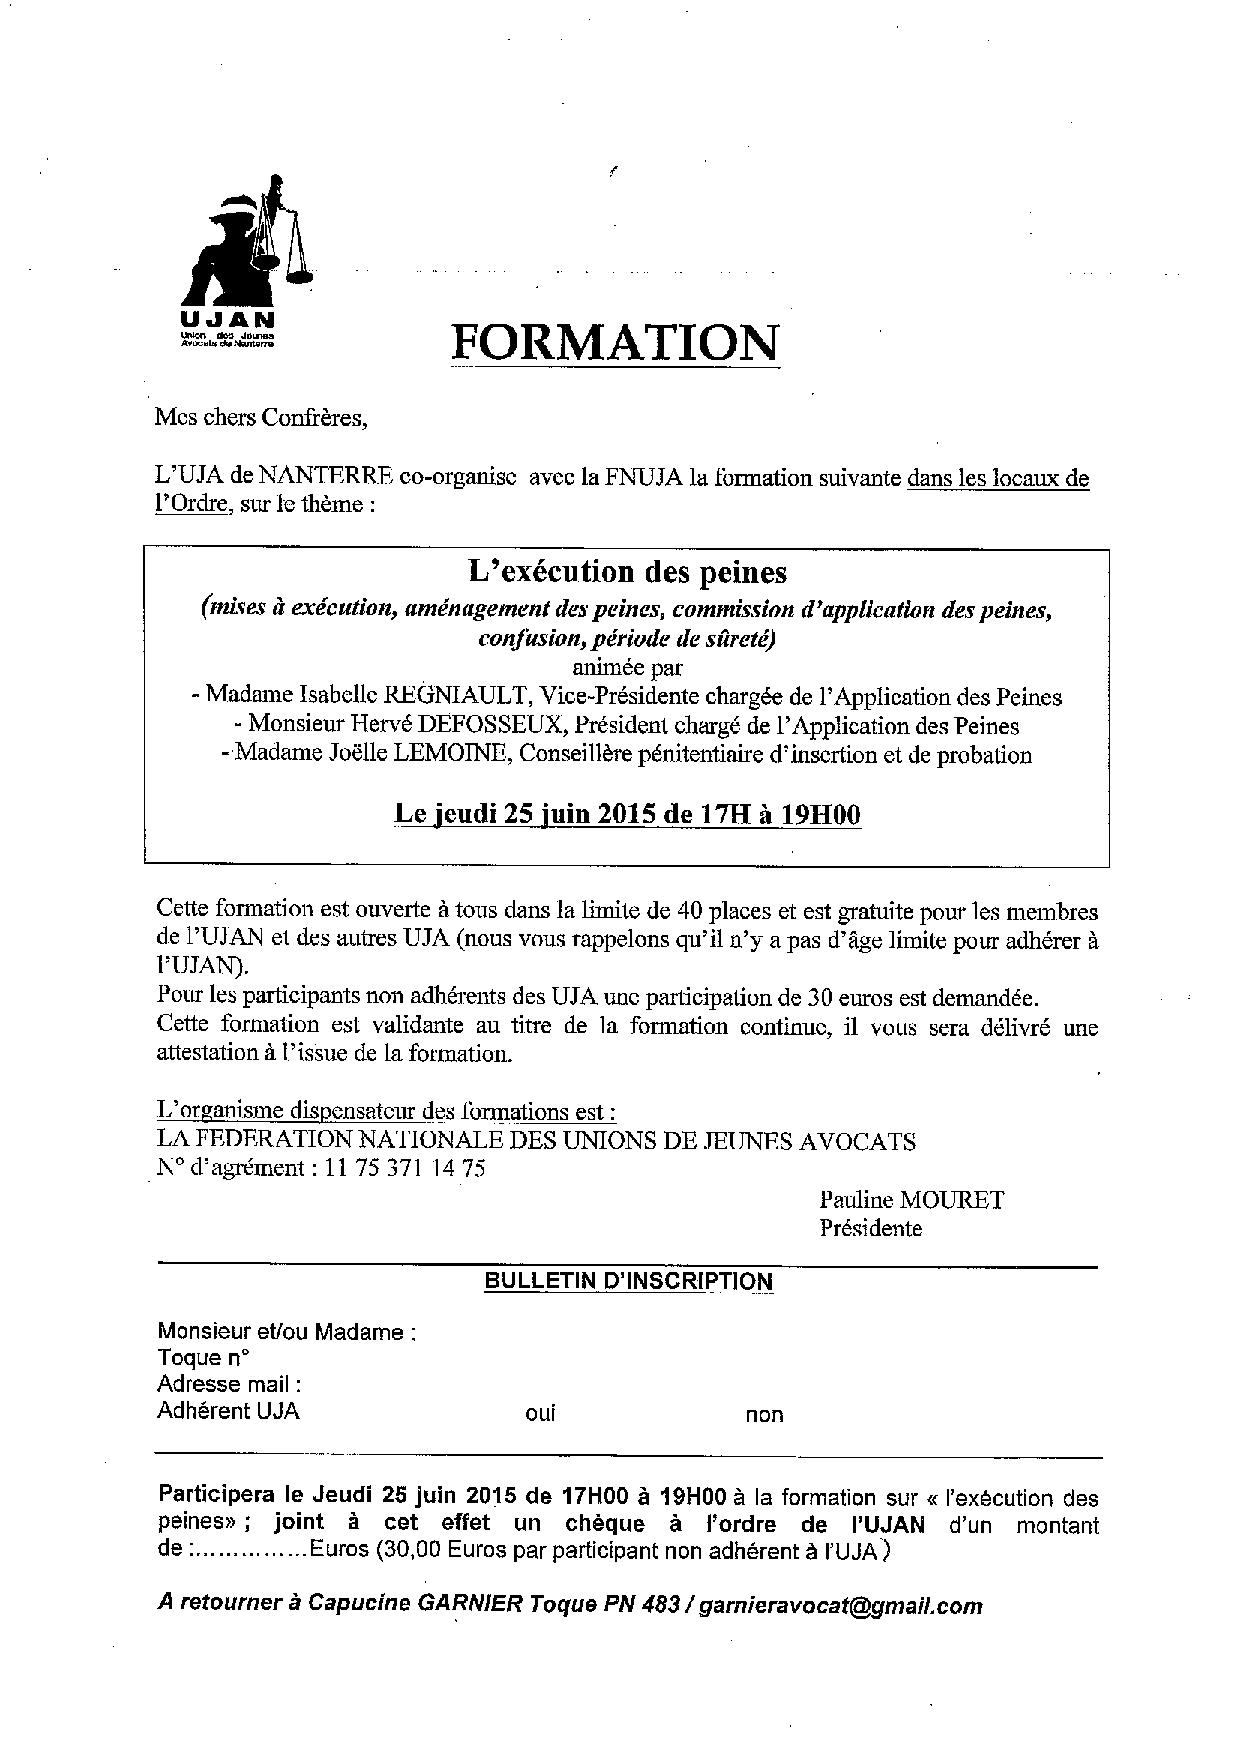 NANTERRE - Formation: l'exécution des peines